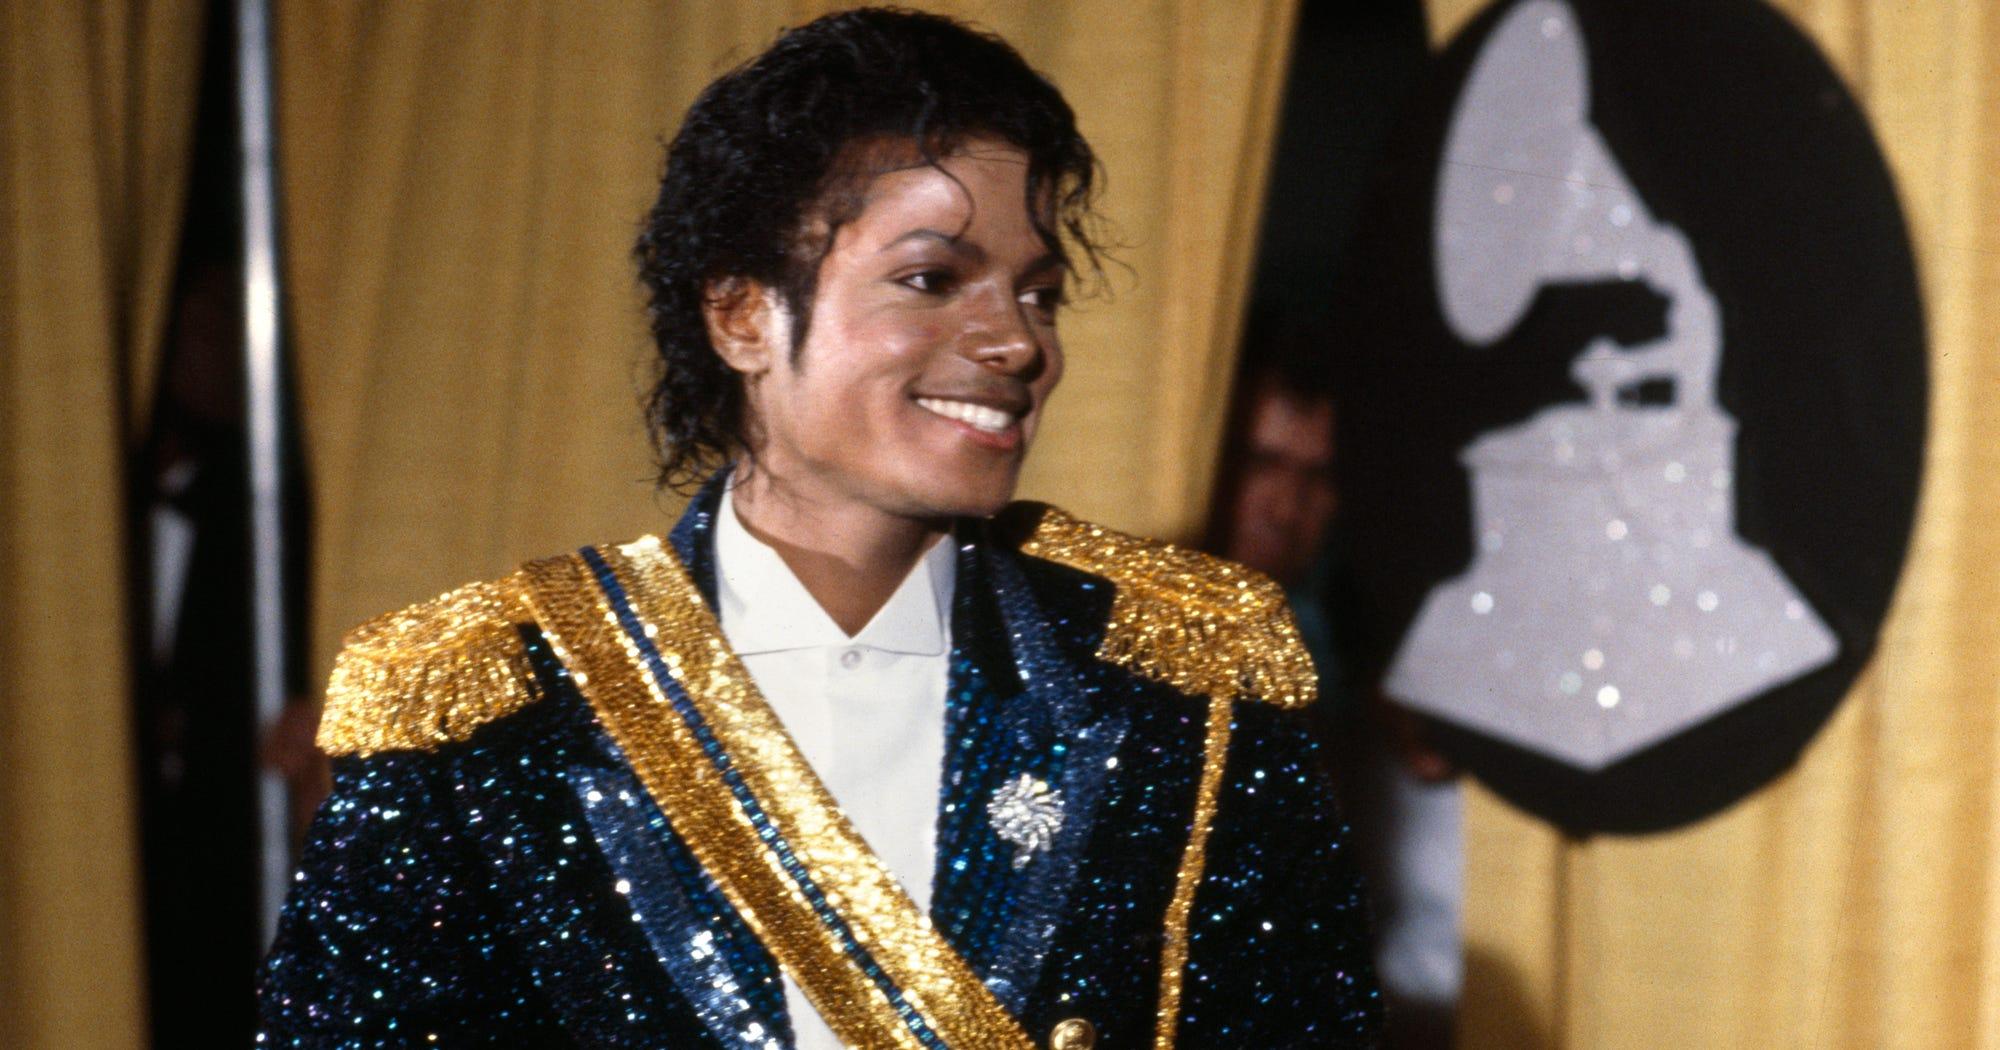 Michael Jackson Net Worth 2019 Estate & Neverland Ranch